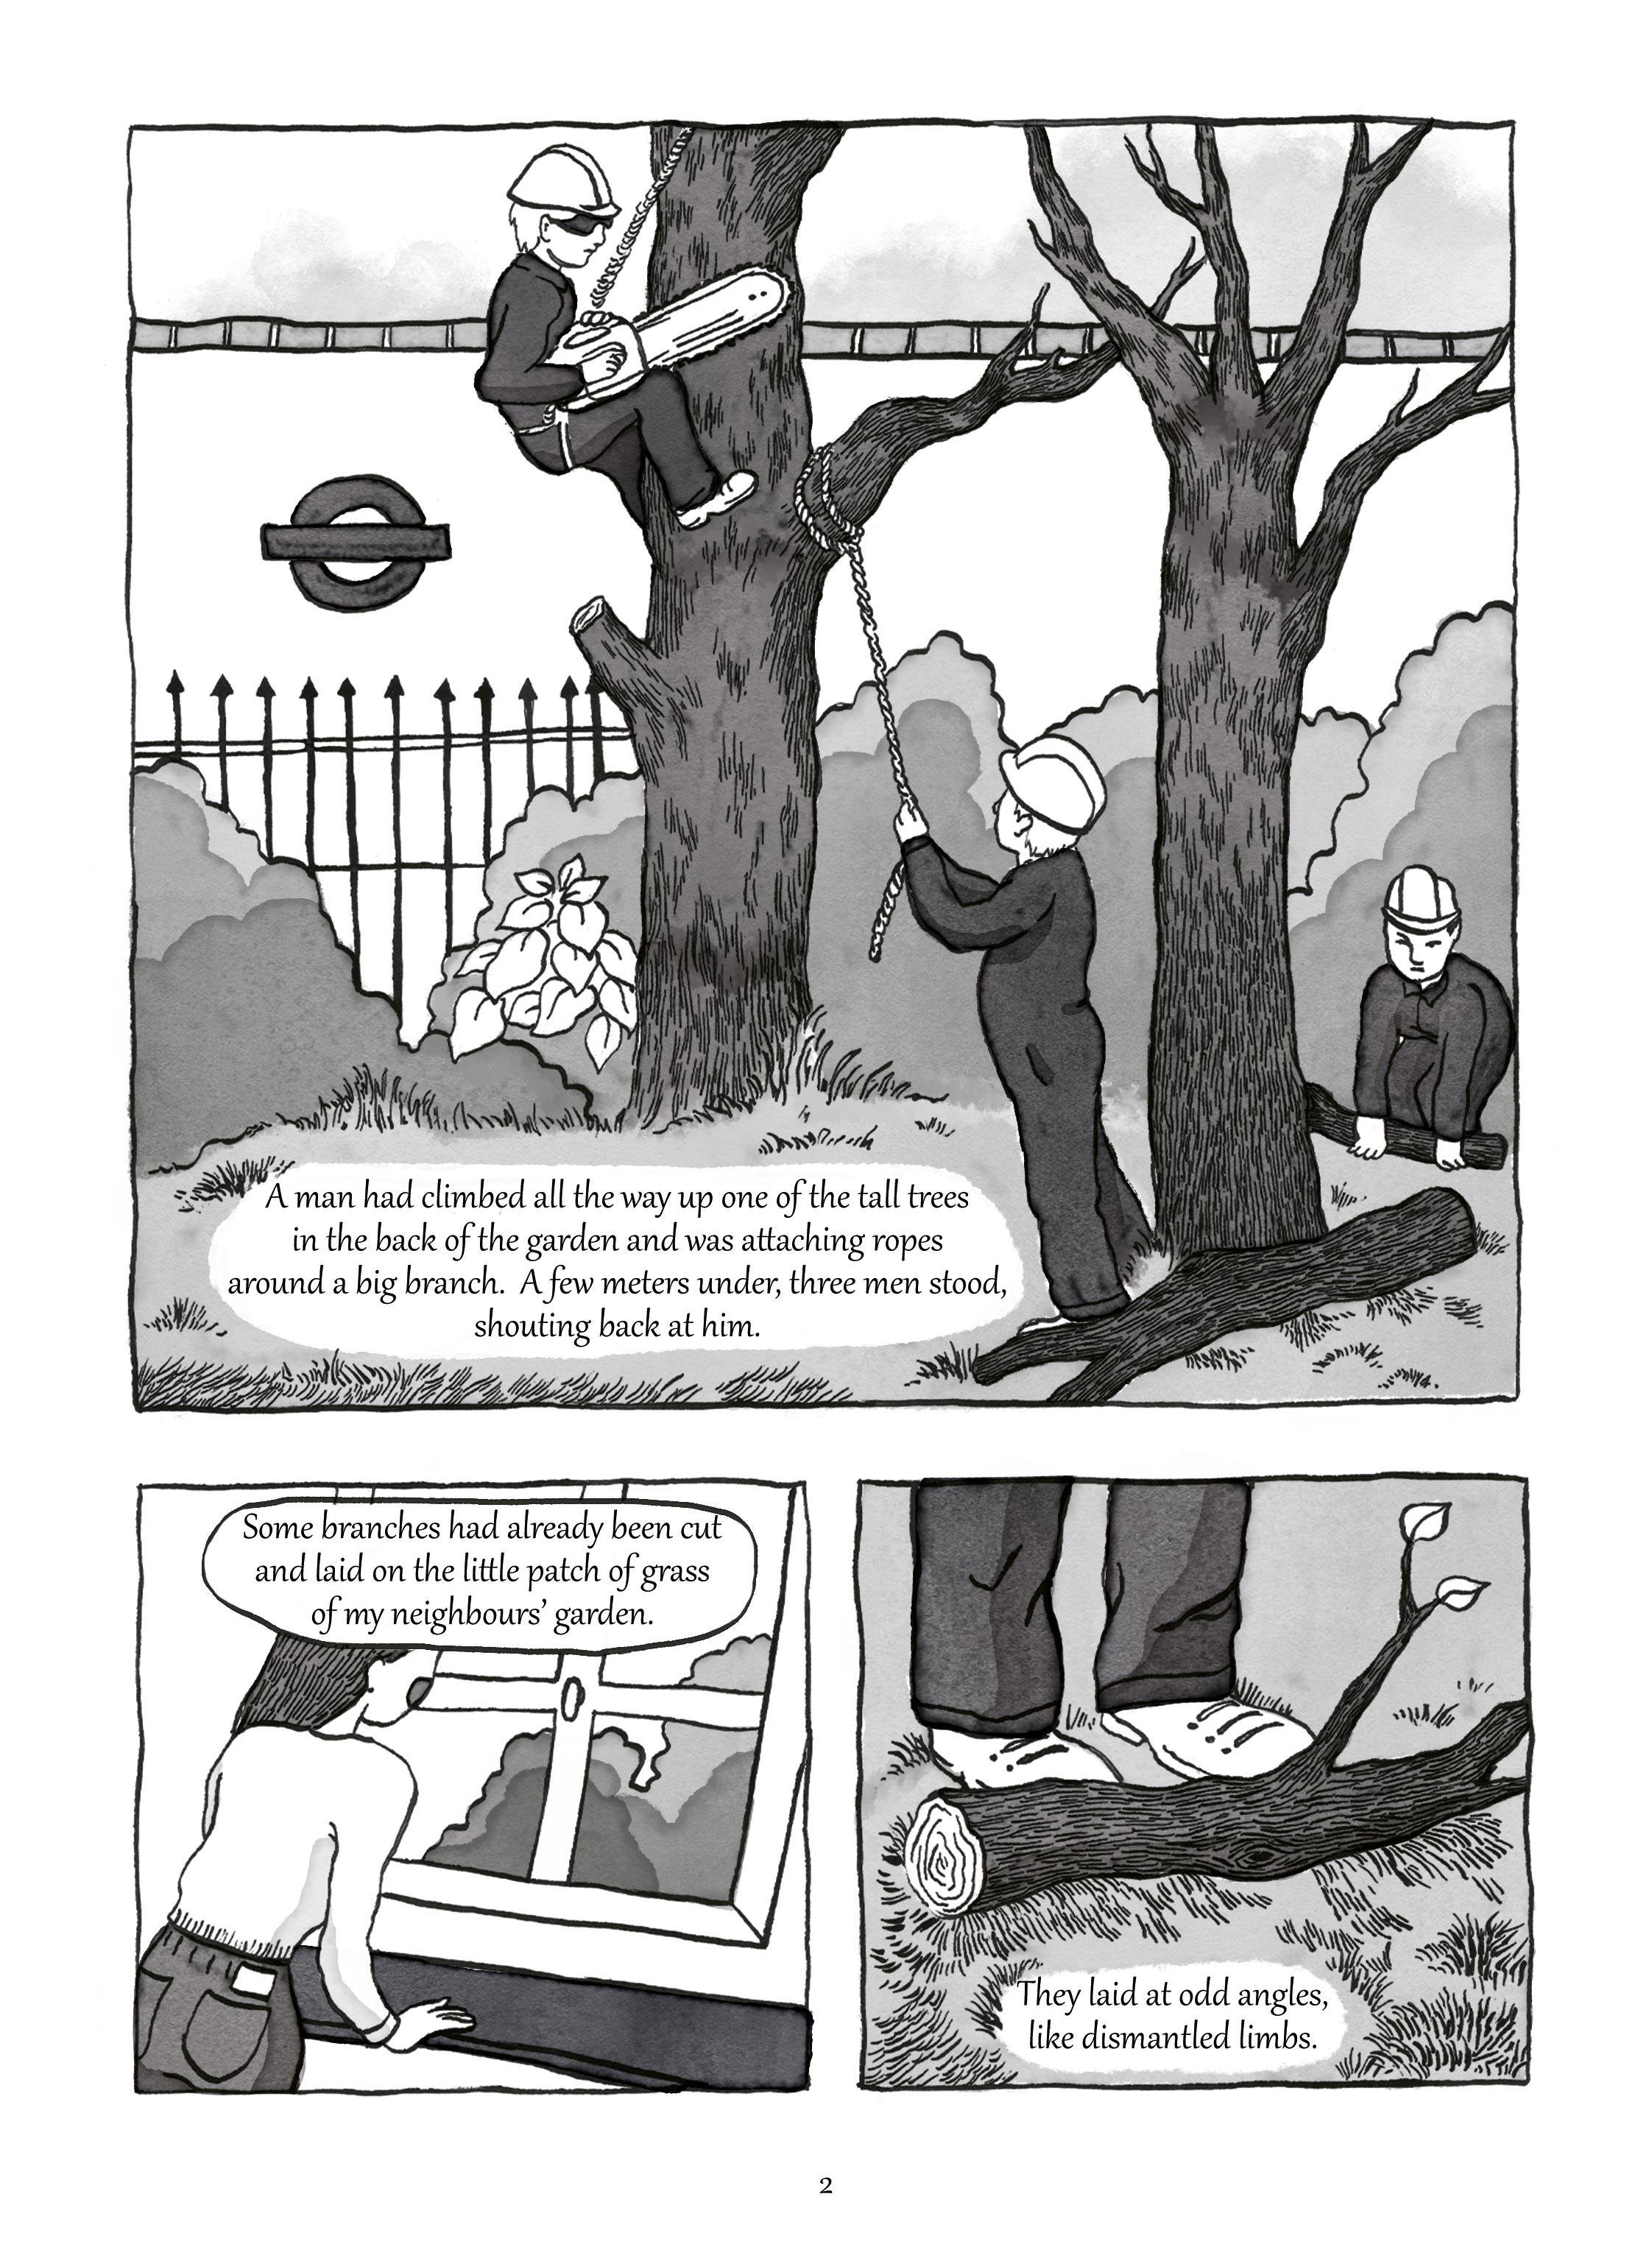 Marie-de-Beaucourt-Illustration-Two-Trees-Graphic-Novel-page2.jpg